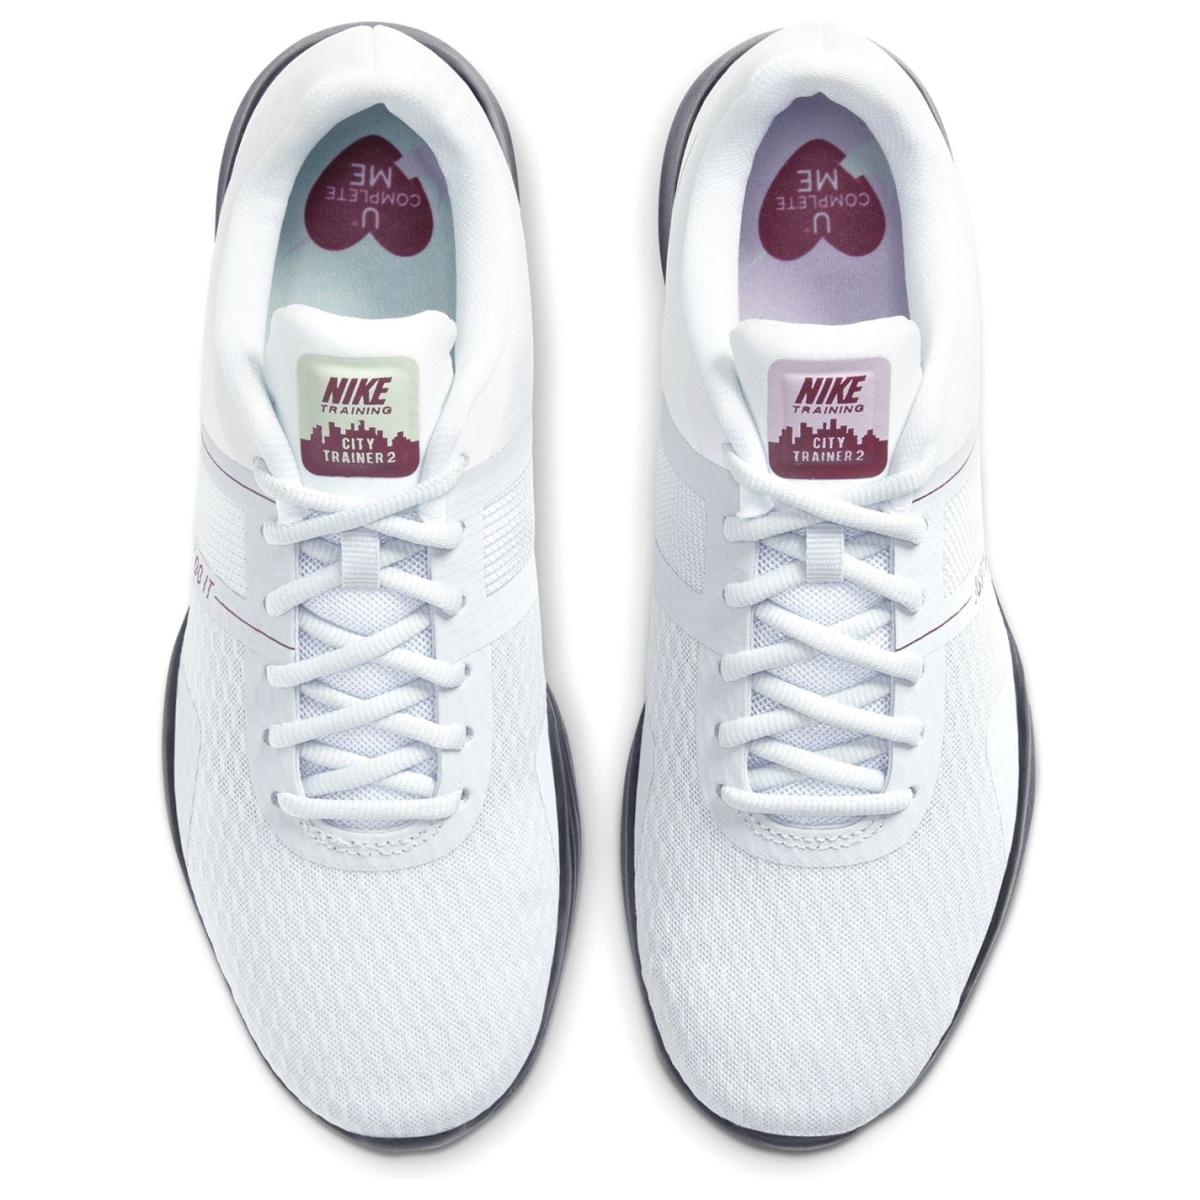 Nike-City-Trainer-2-Turnschuhe-Laufschuhe-Damen-Sportschuhe-Sneaker-3121 Indexbild 14